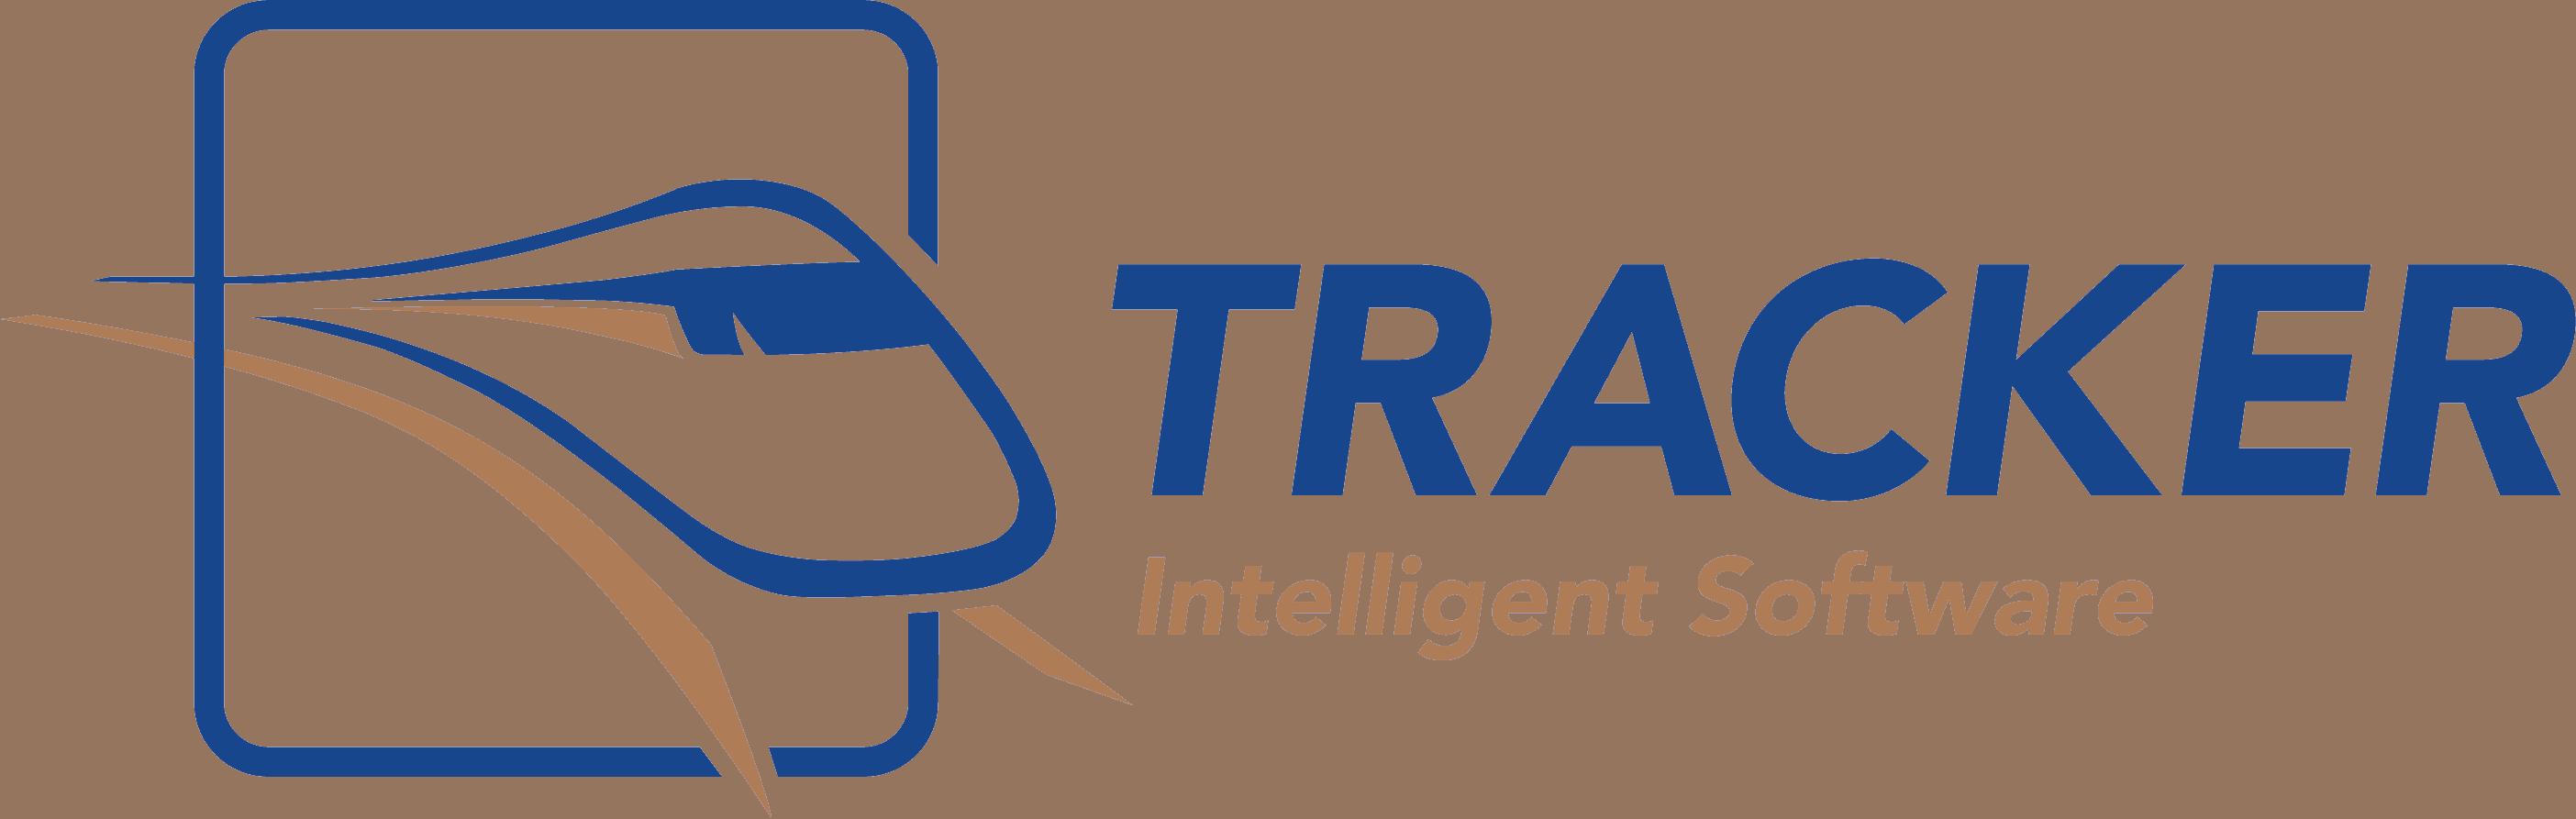 Tracker Intelligence Software Logo